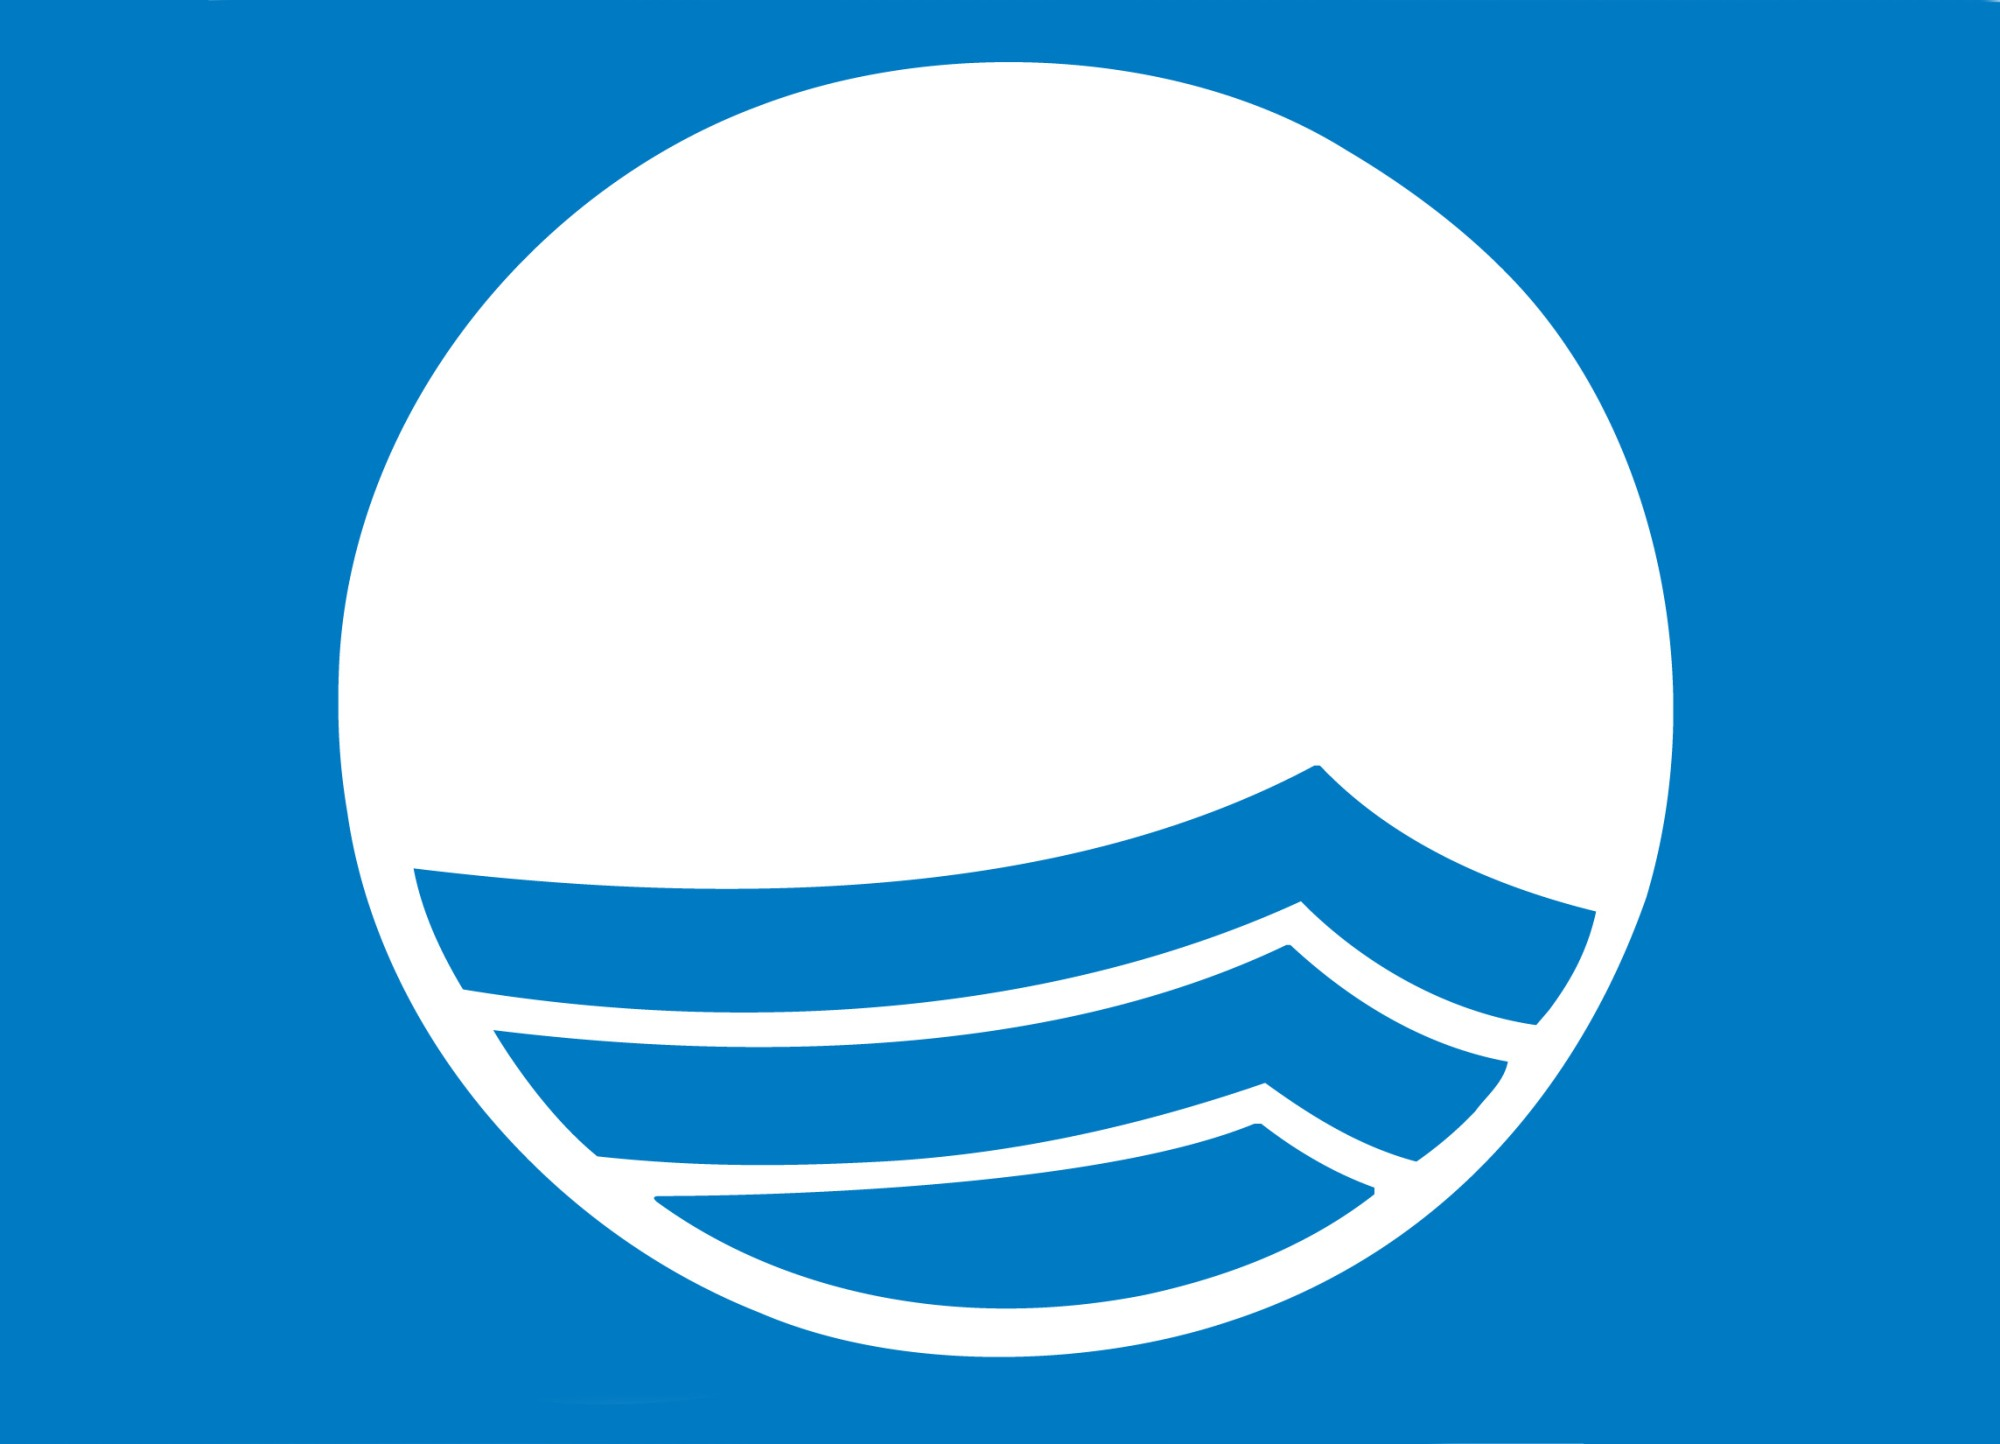 Logo Blauwe vlag